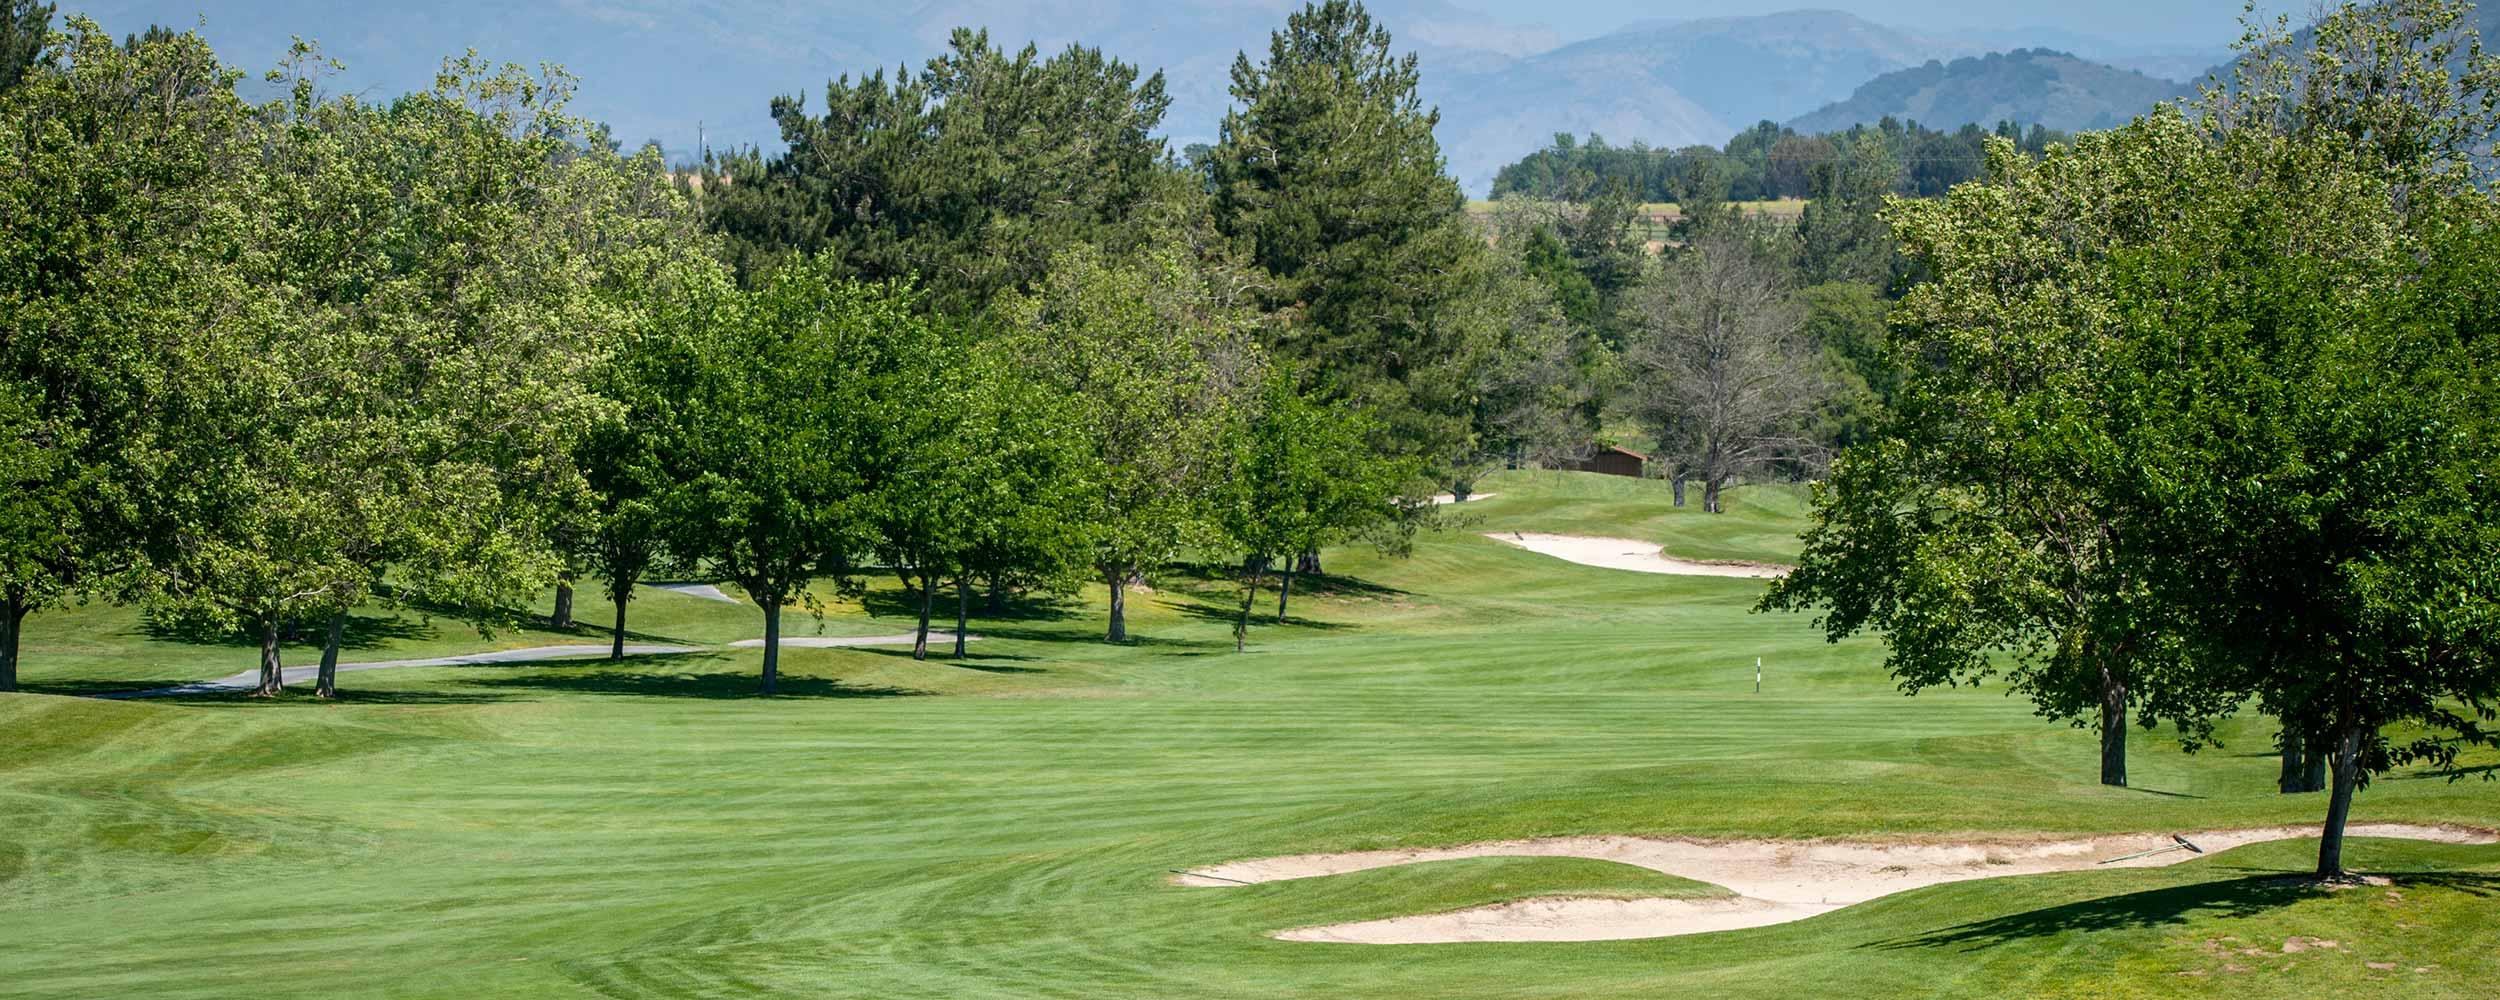 Alisal Ranch Golf Course - Alisal Resort in Solvang California